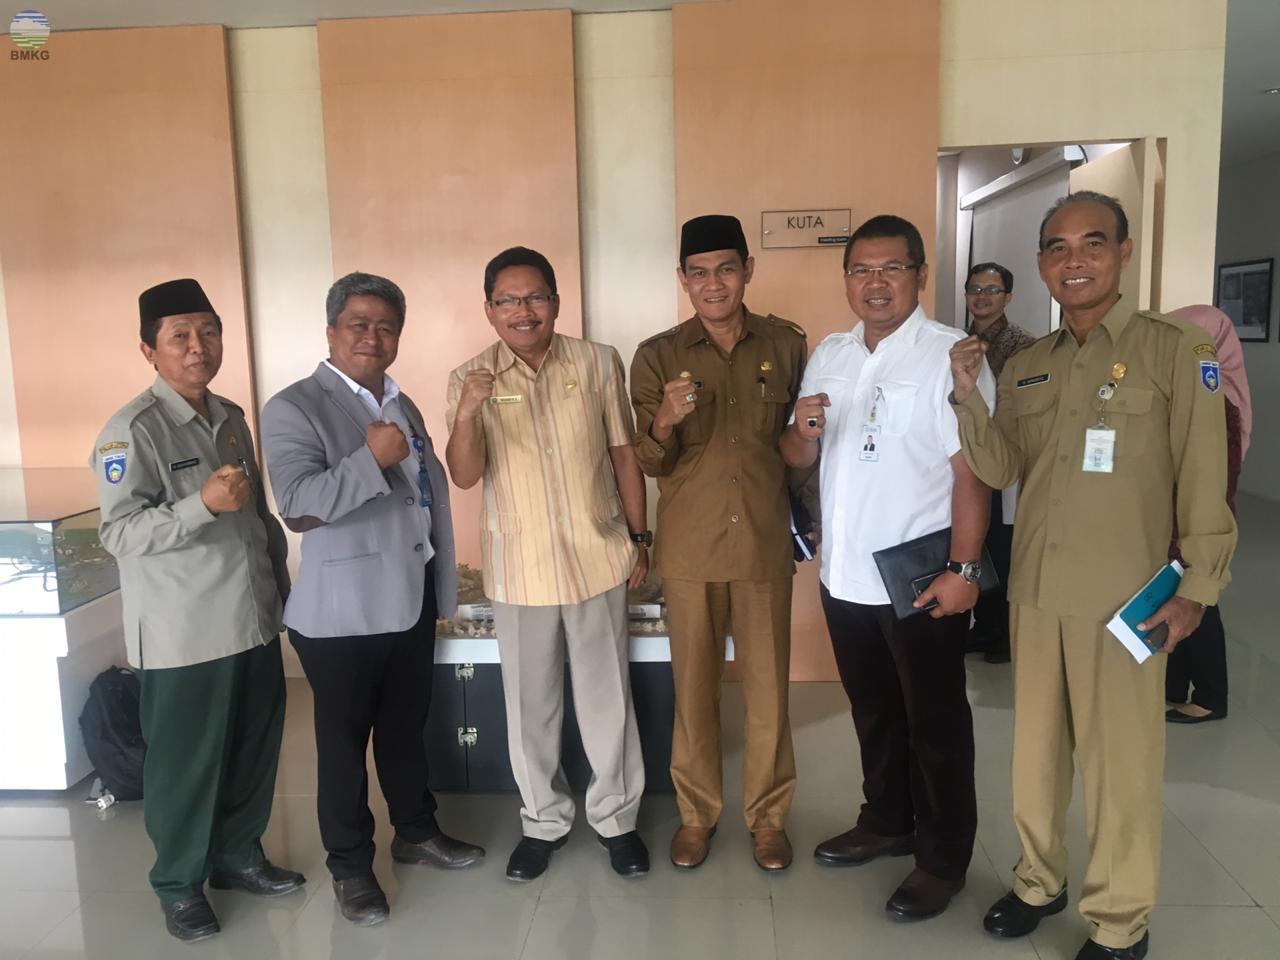 Partisipasi Stageof Mataram dalam Penyusunan Pedoman Mitigasi Bencana